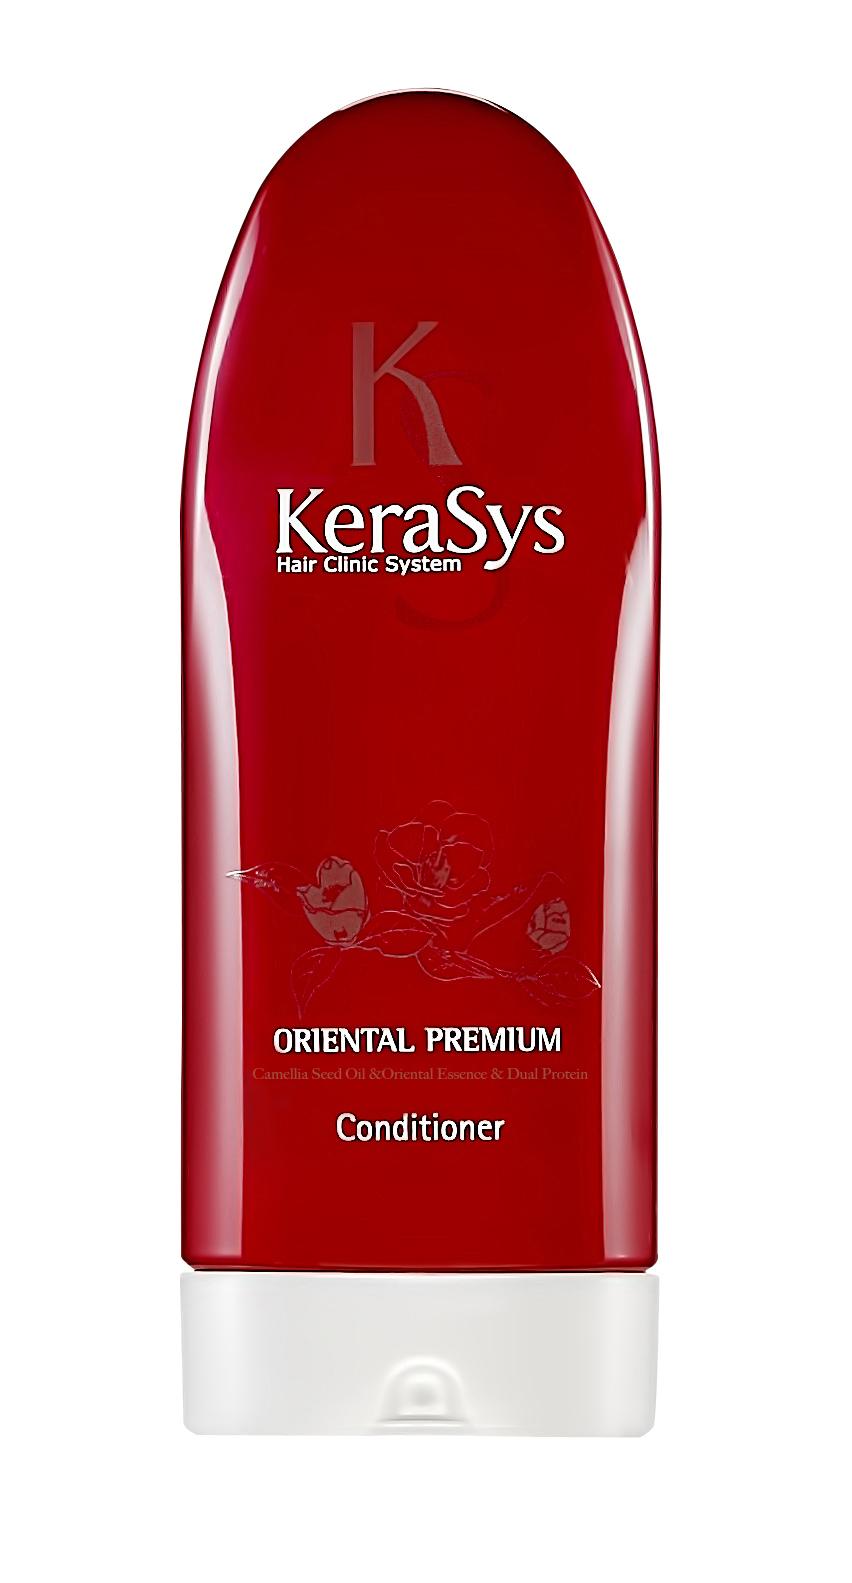 Kerasys Кондиционер для волос Oriental, 200 мл кондиционер kerasys для волос оздоравливающий 600 мл